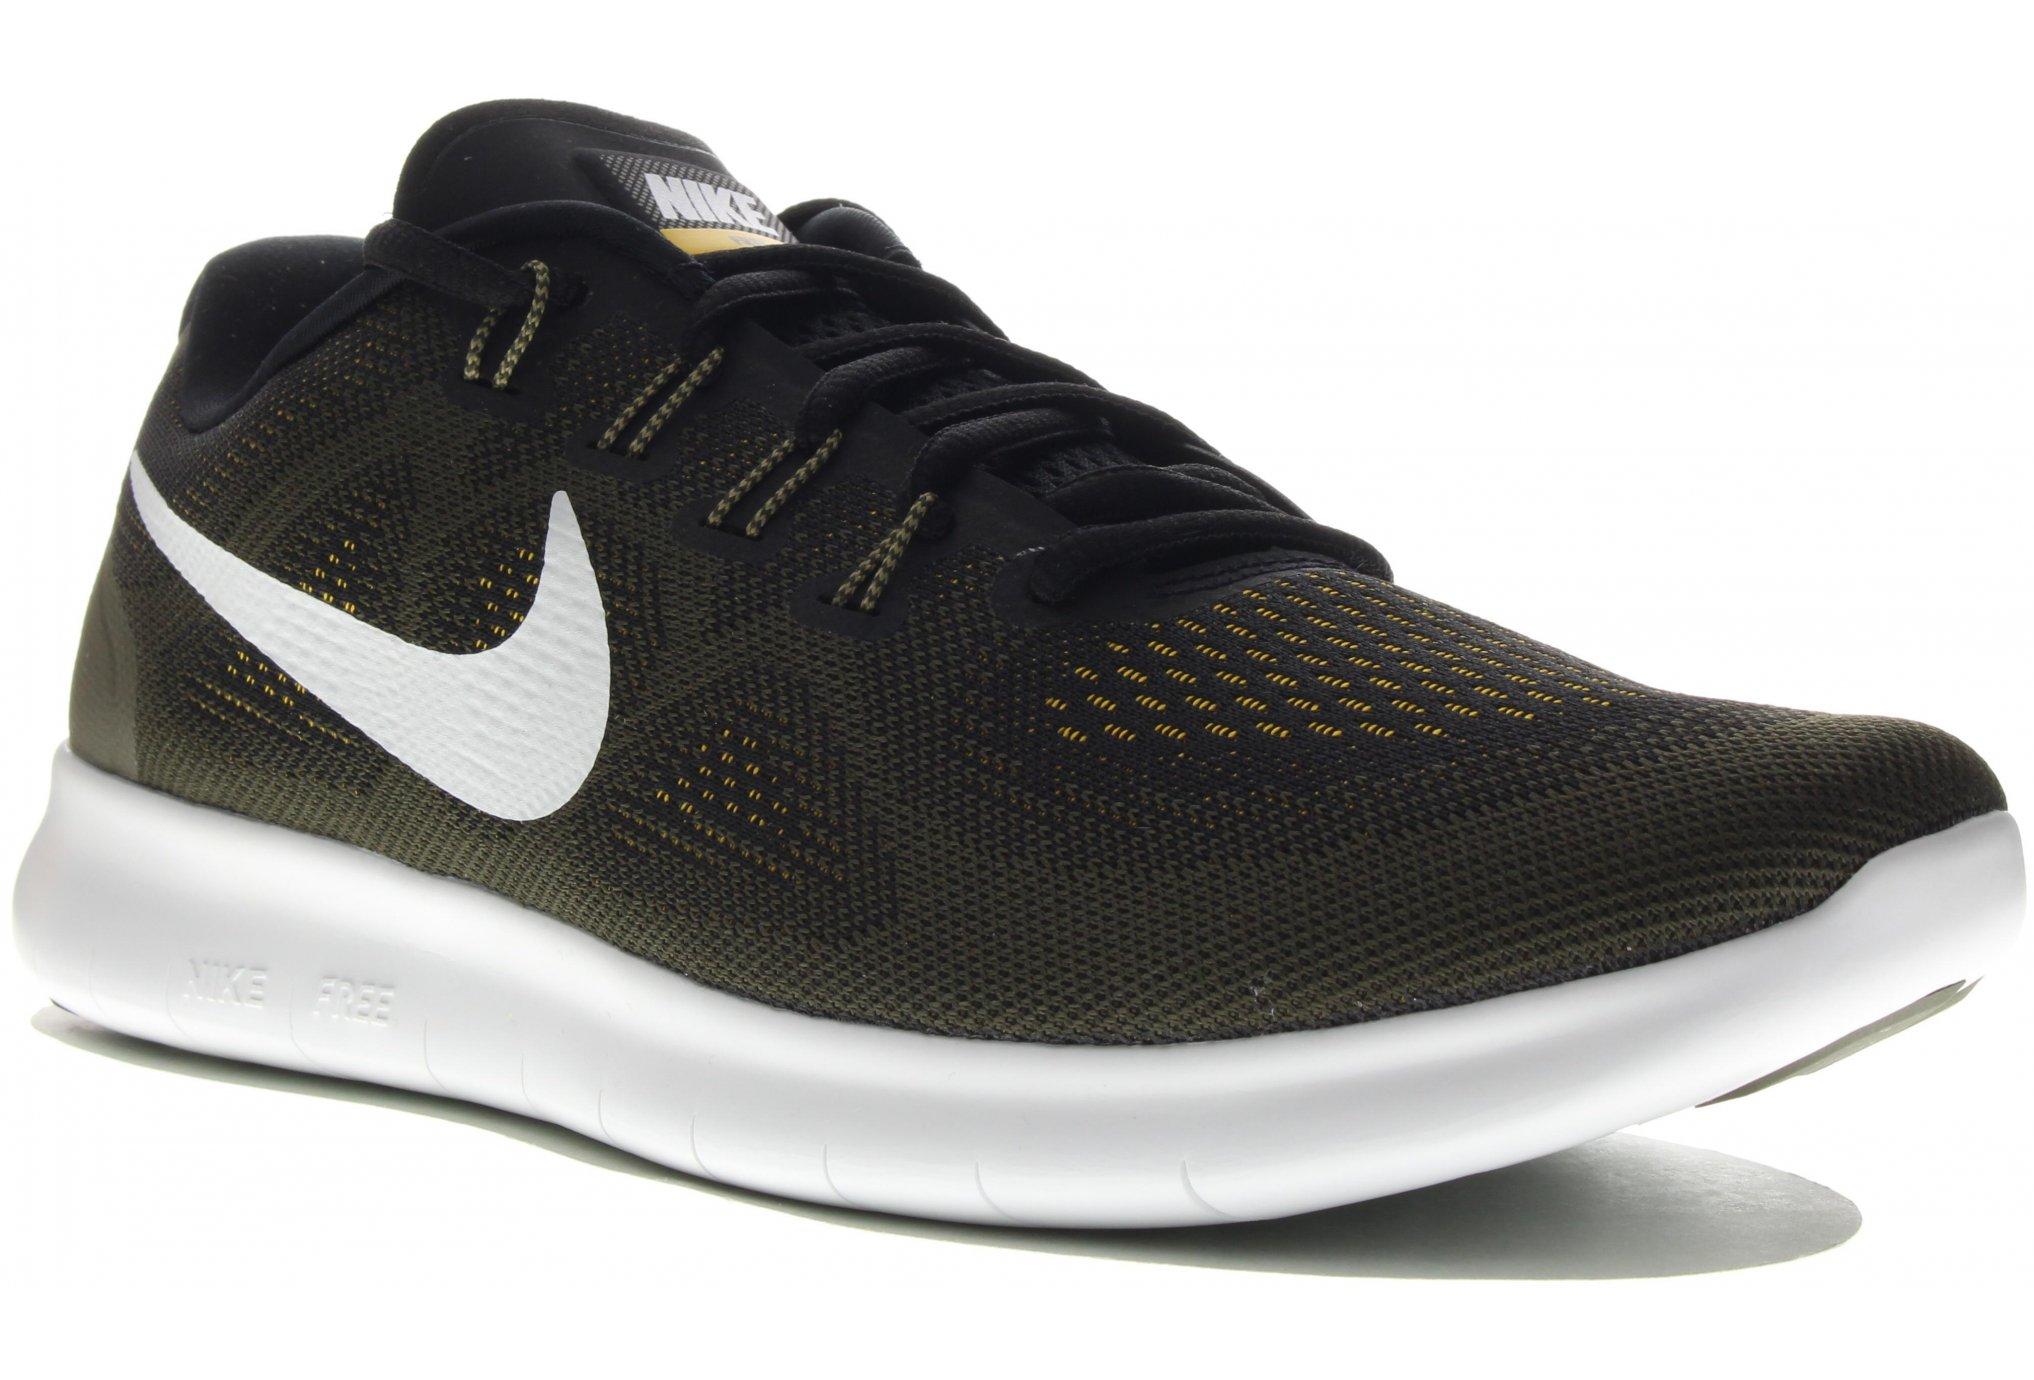 8d003d17d6dd Precios de Nike Free RN 2017 baratas - Ofertas para comprar online ...